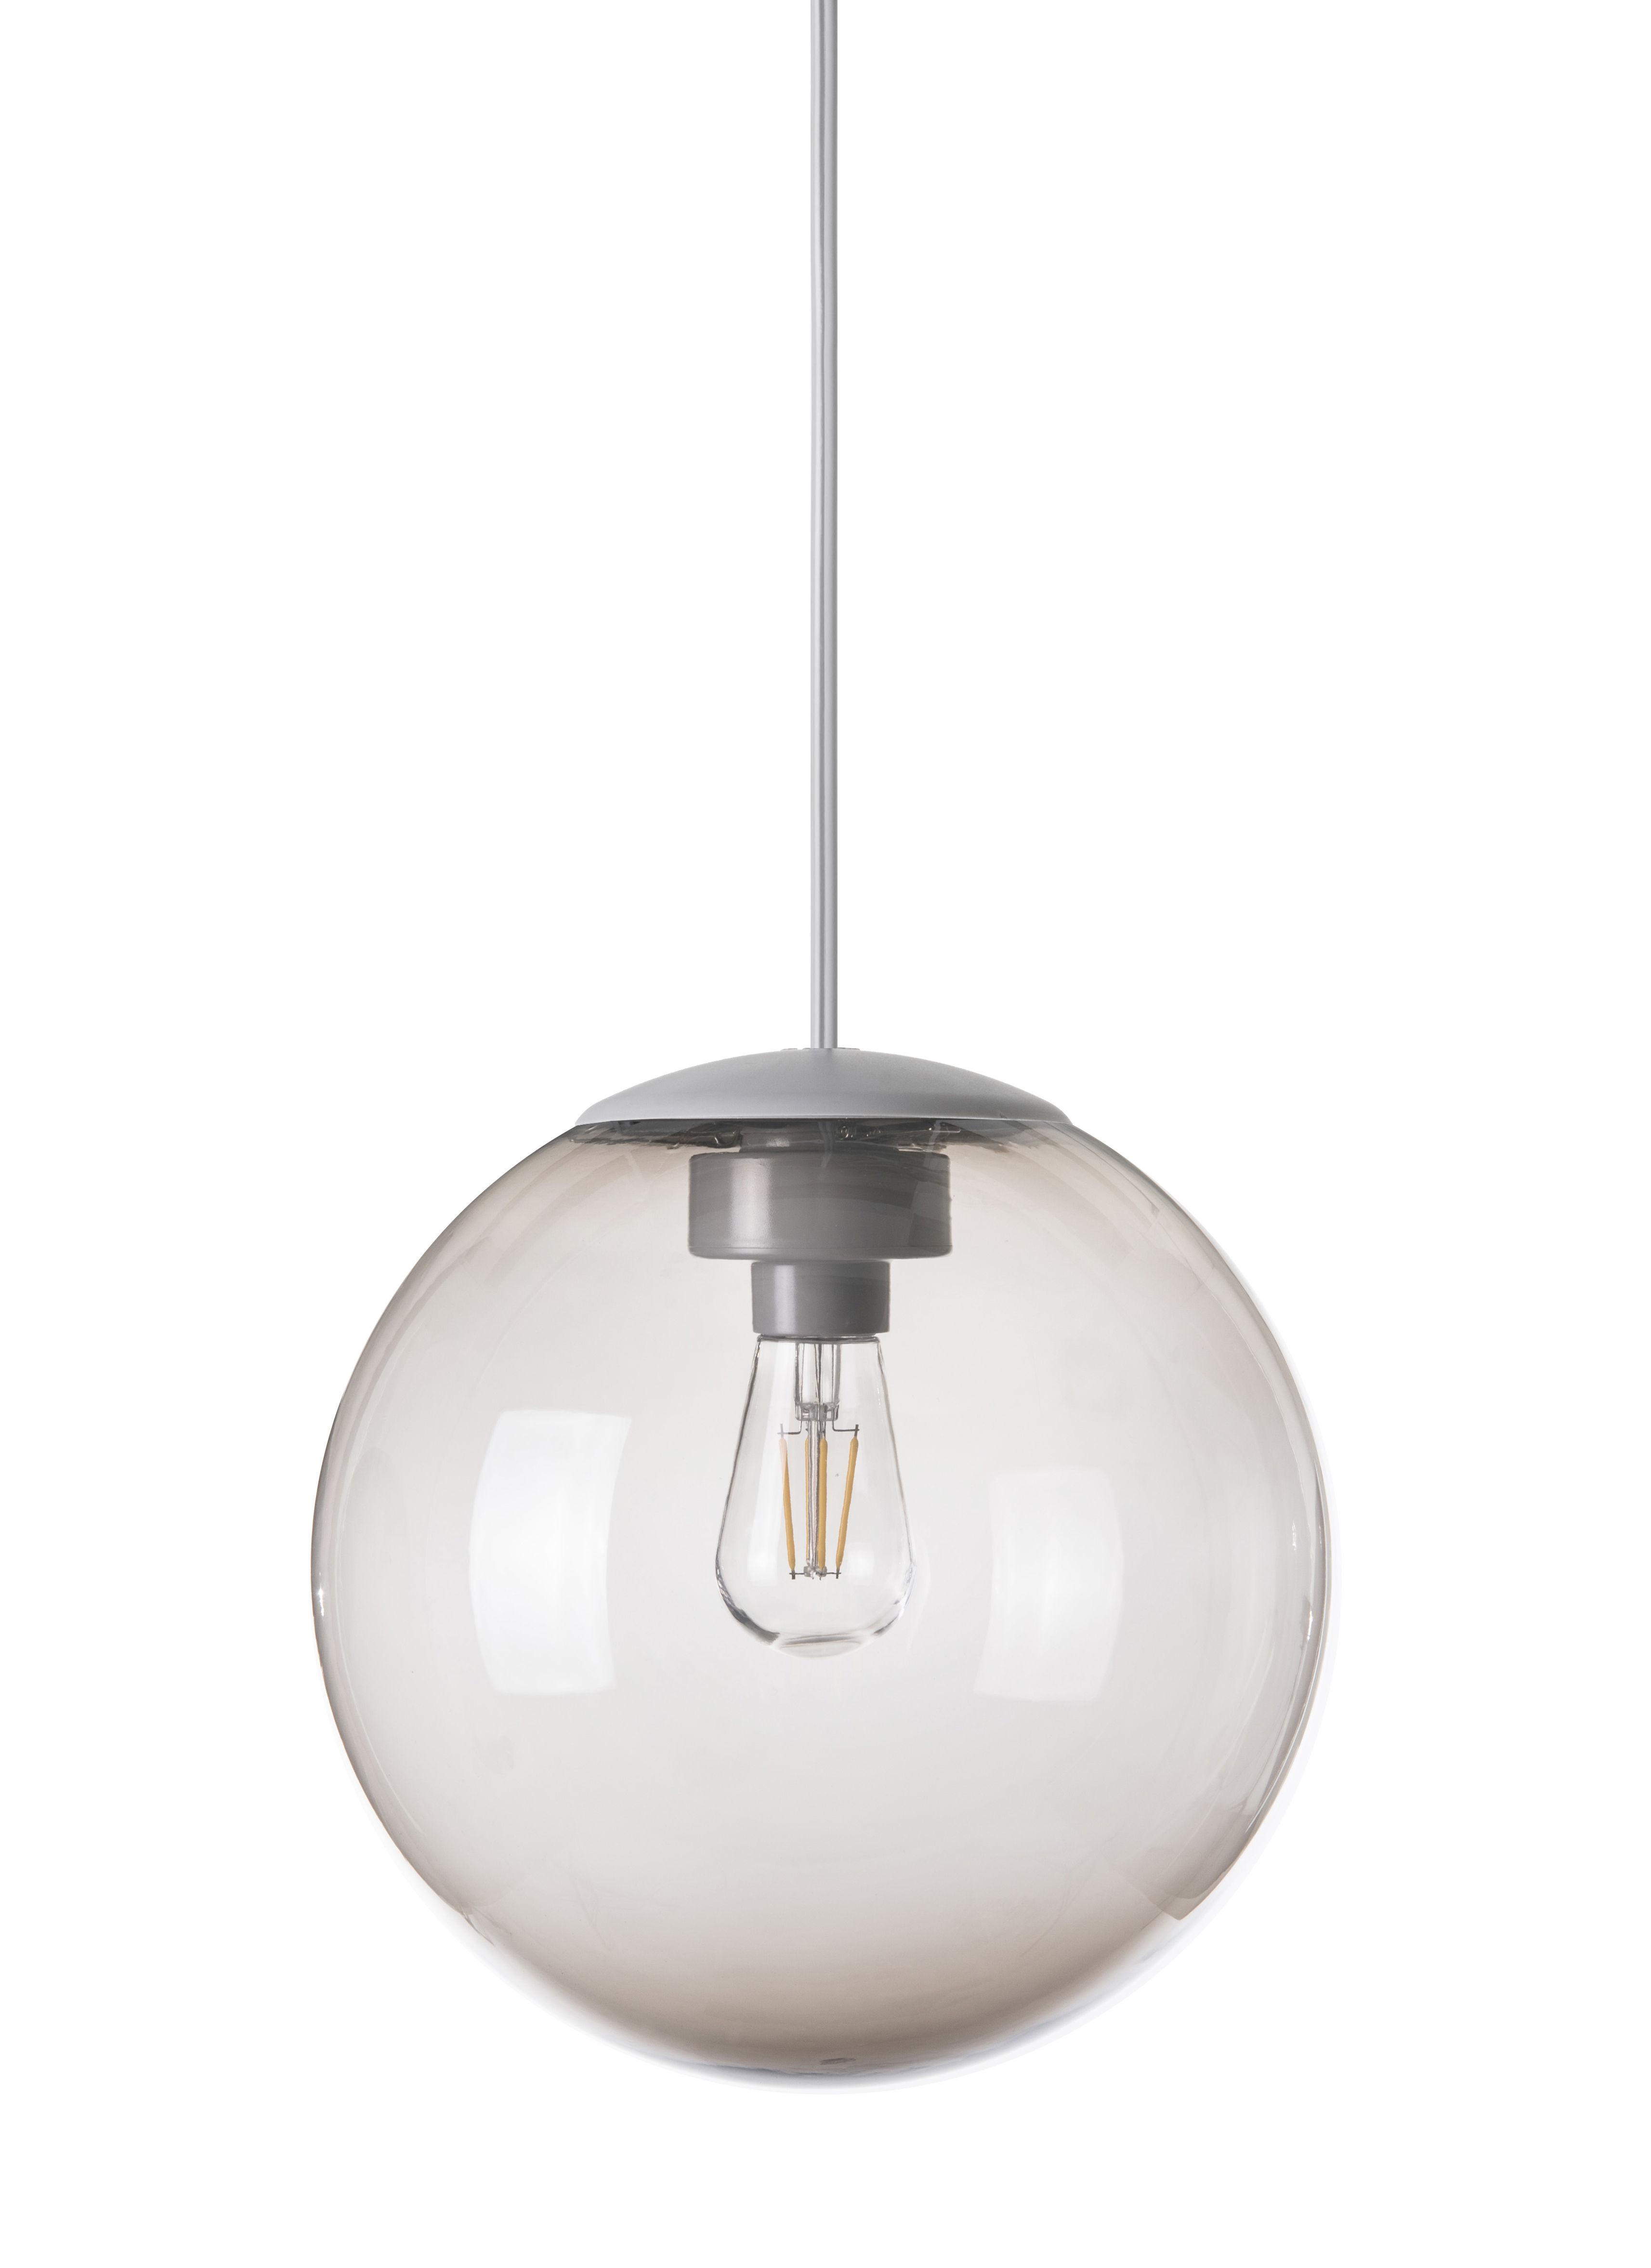 Lighting - Pendant Lighting - Spheremaker Pendant - Ø 25 cm by Fatboy - Taupe - PMMA